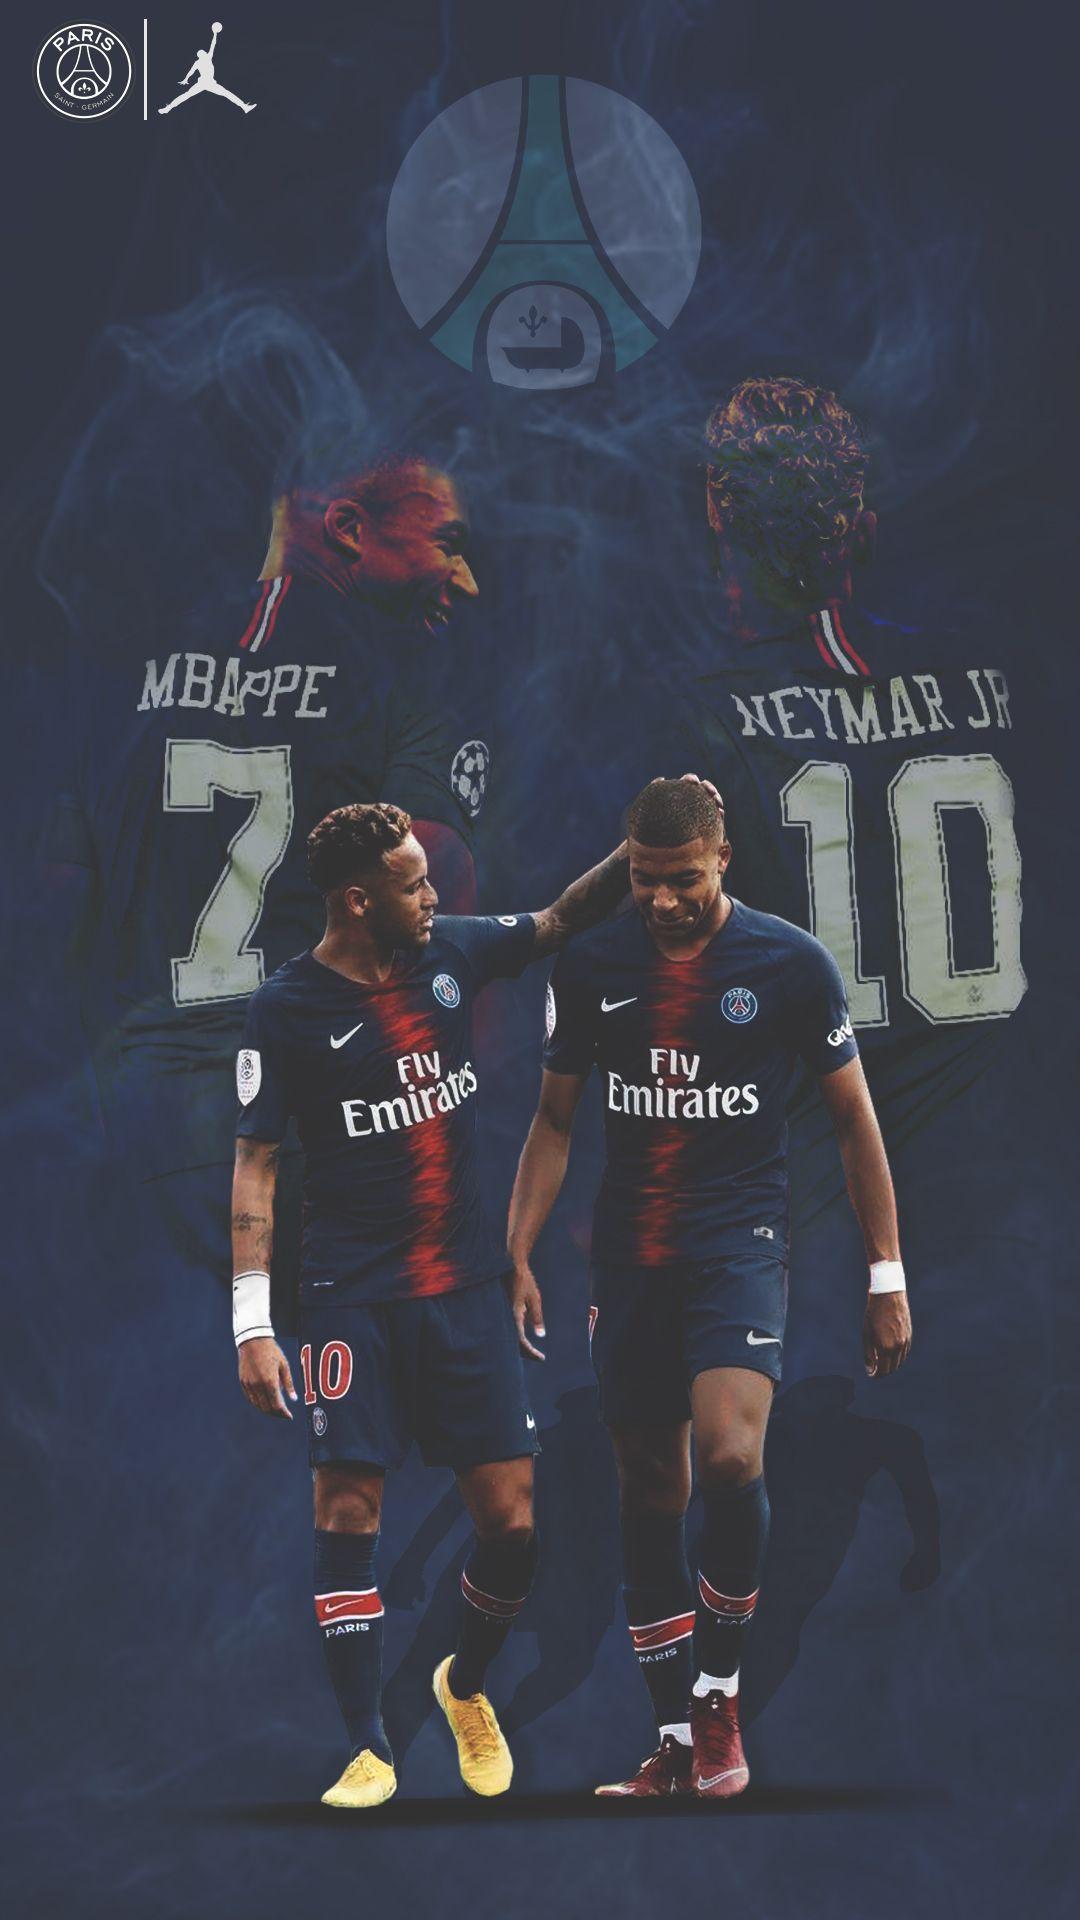 "Neymar Kylianmbappe Psg Wallpaper Mercurial France Brazil ̘¤ì›¬ ̃Œë"""" Joueur De Football Images De Football Fond D Ecran Foot"